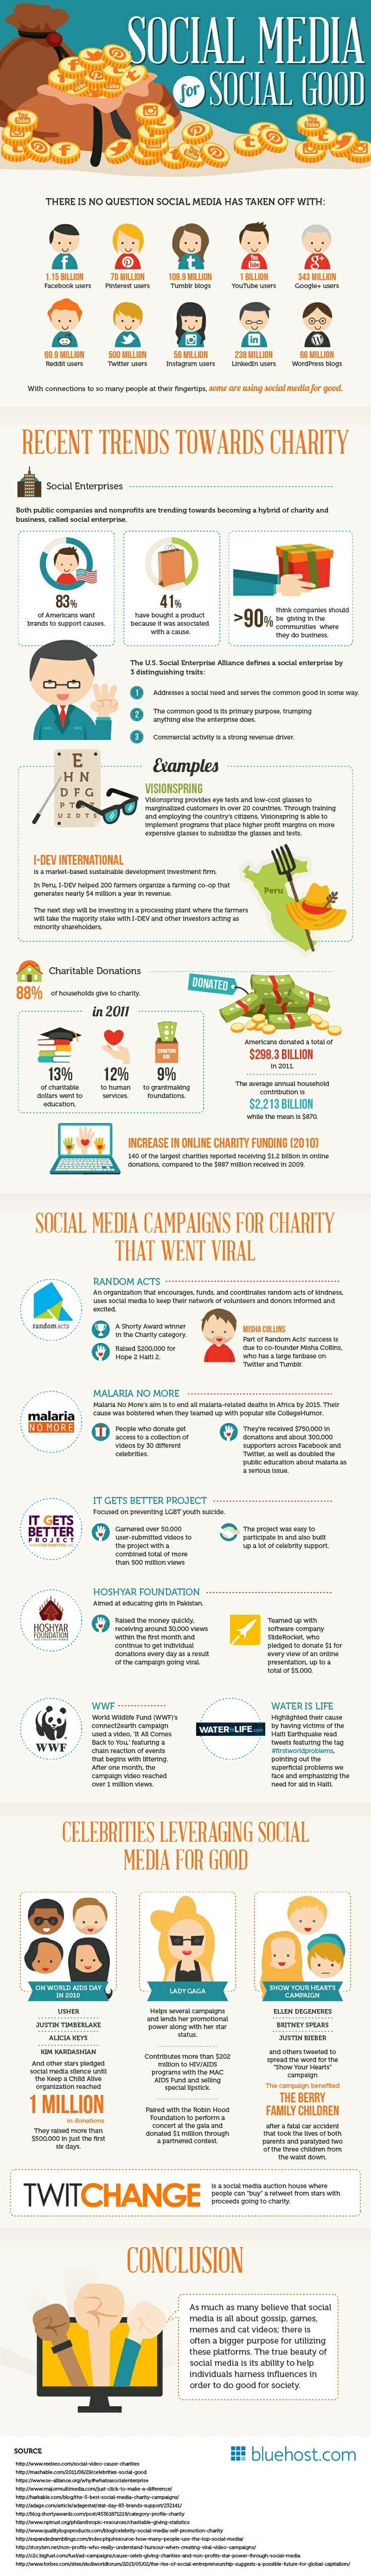 Using Social Media For Social Good (Infographic) #socialmedia #infographic